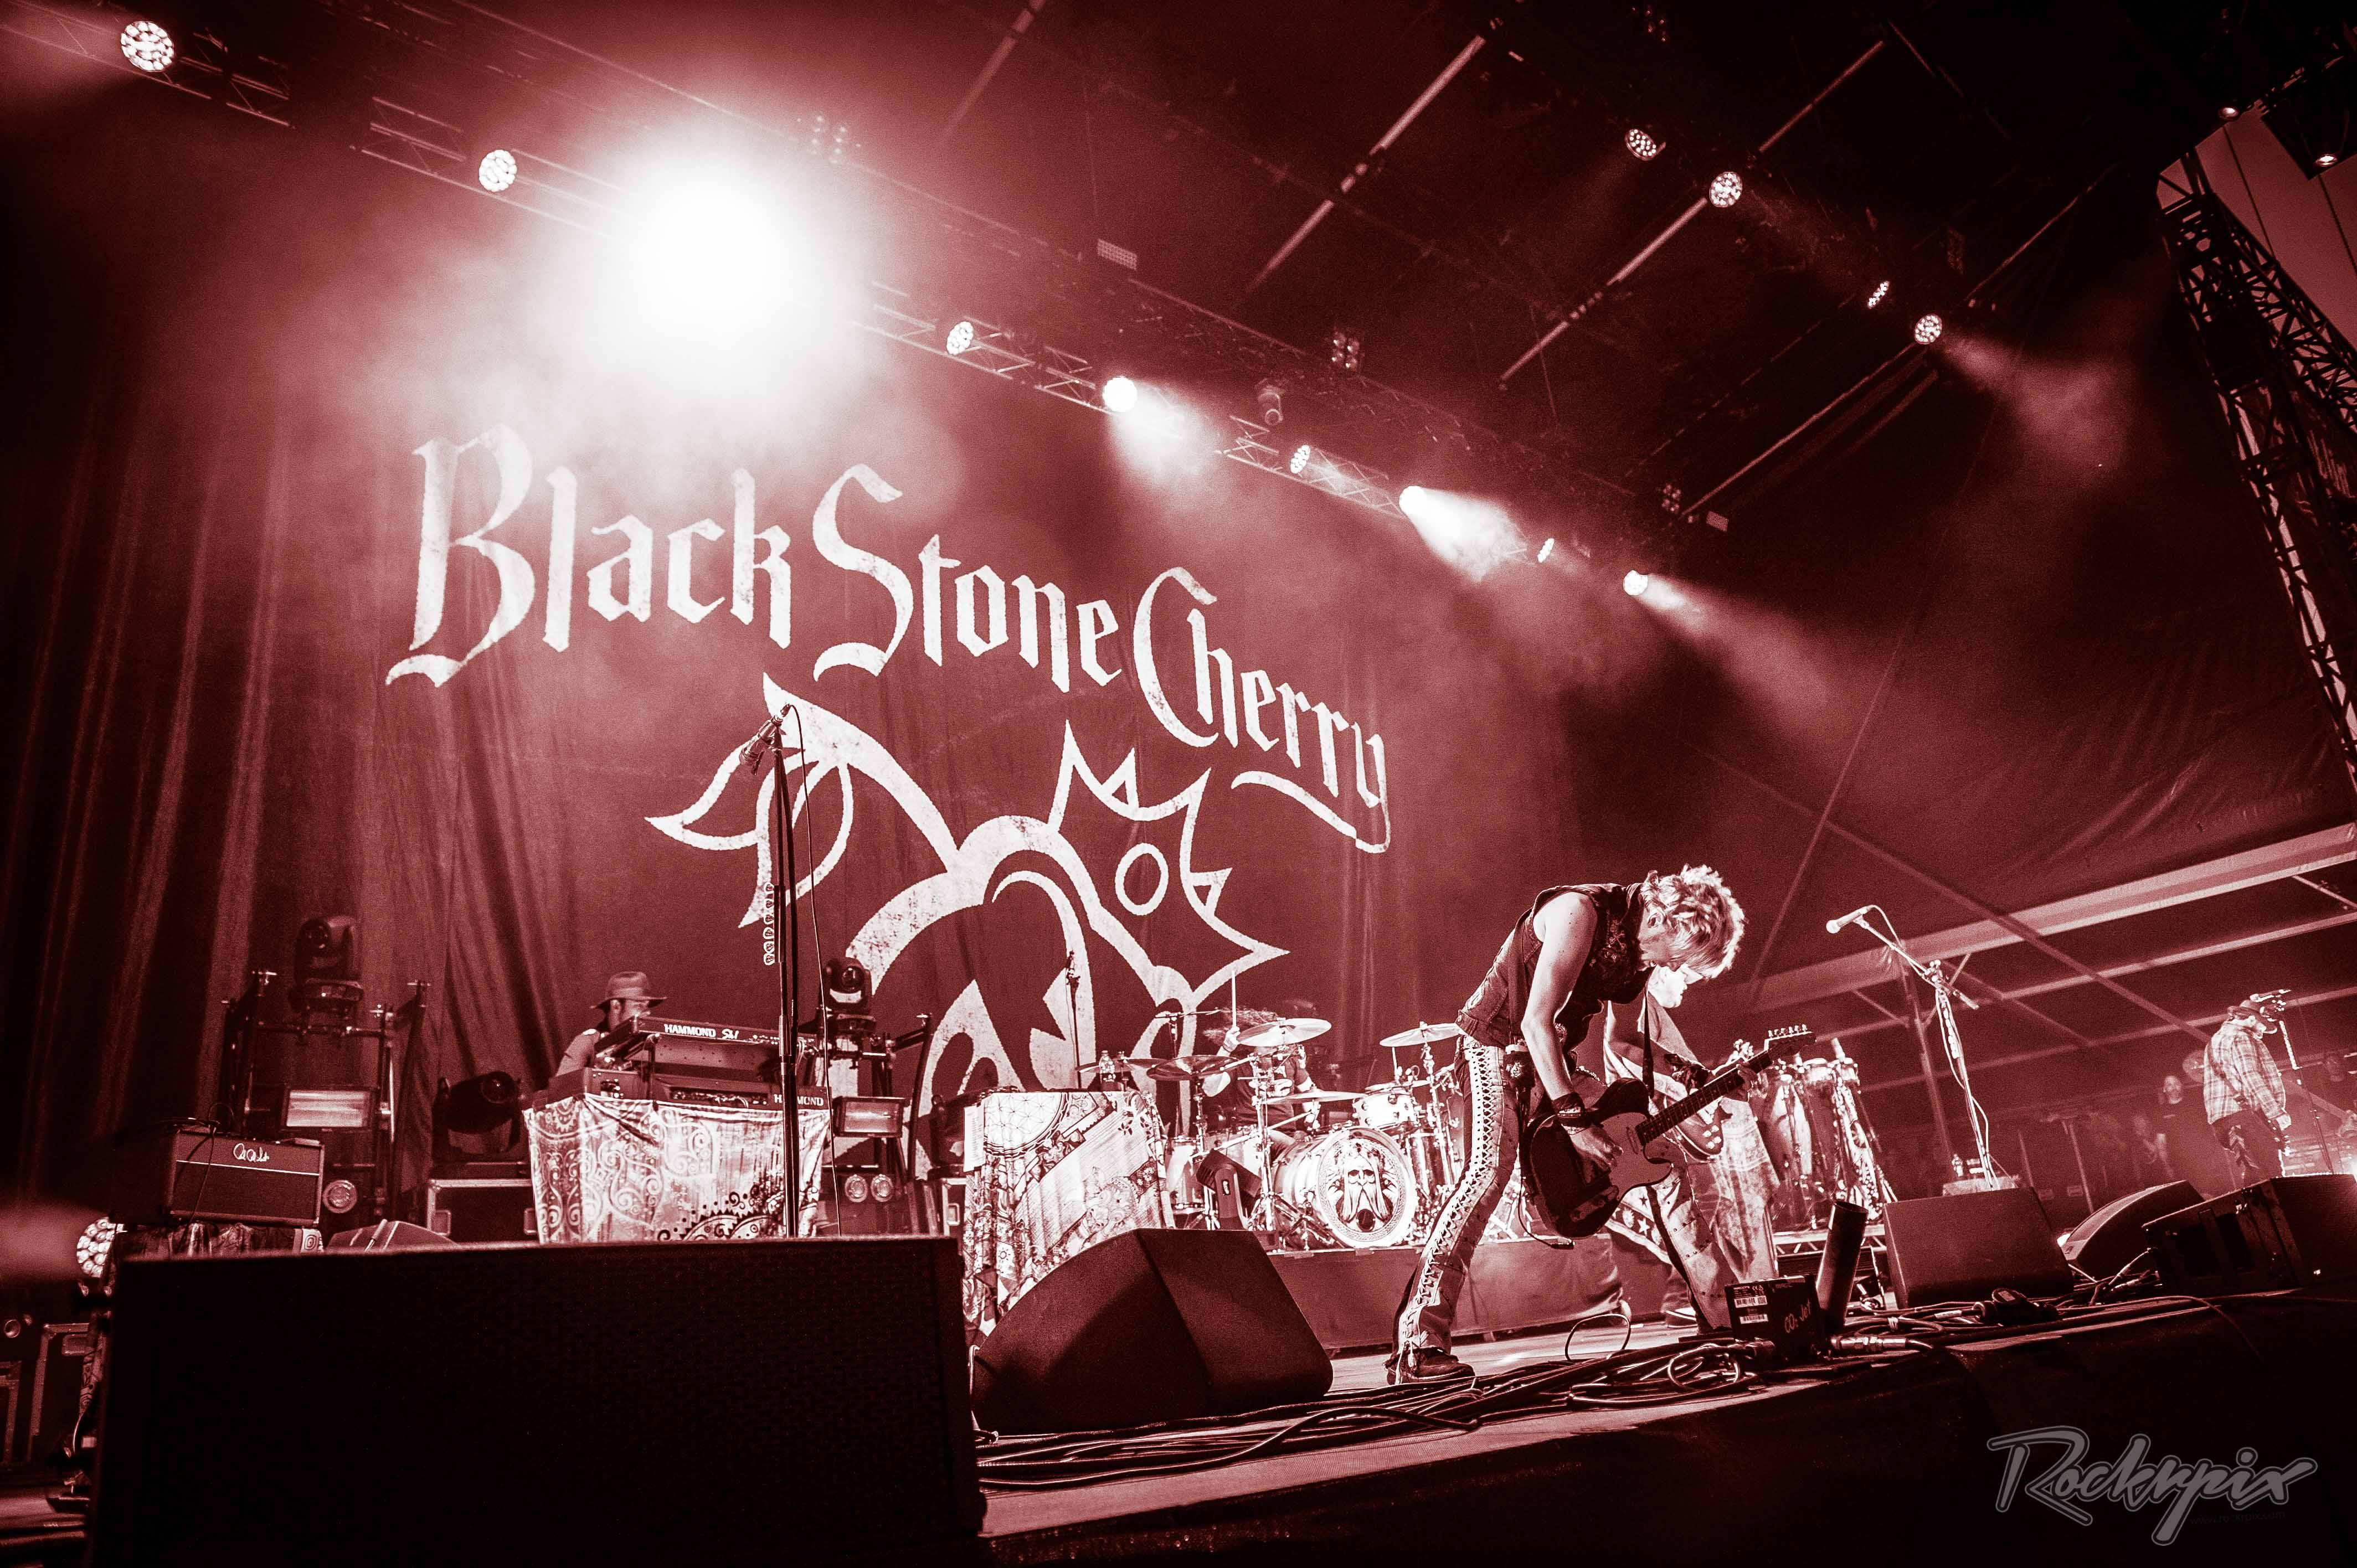 BlackStoneCherry-1372.jpg